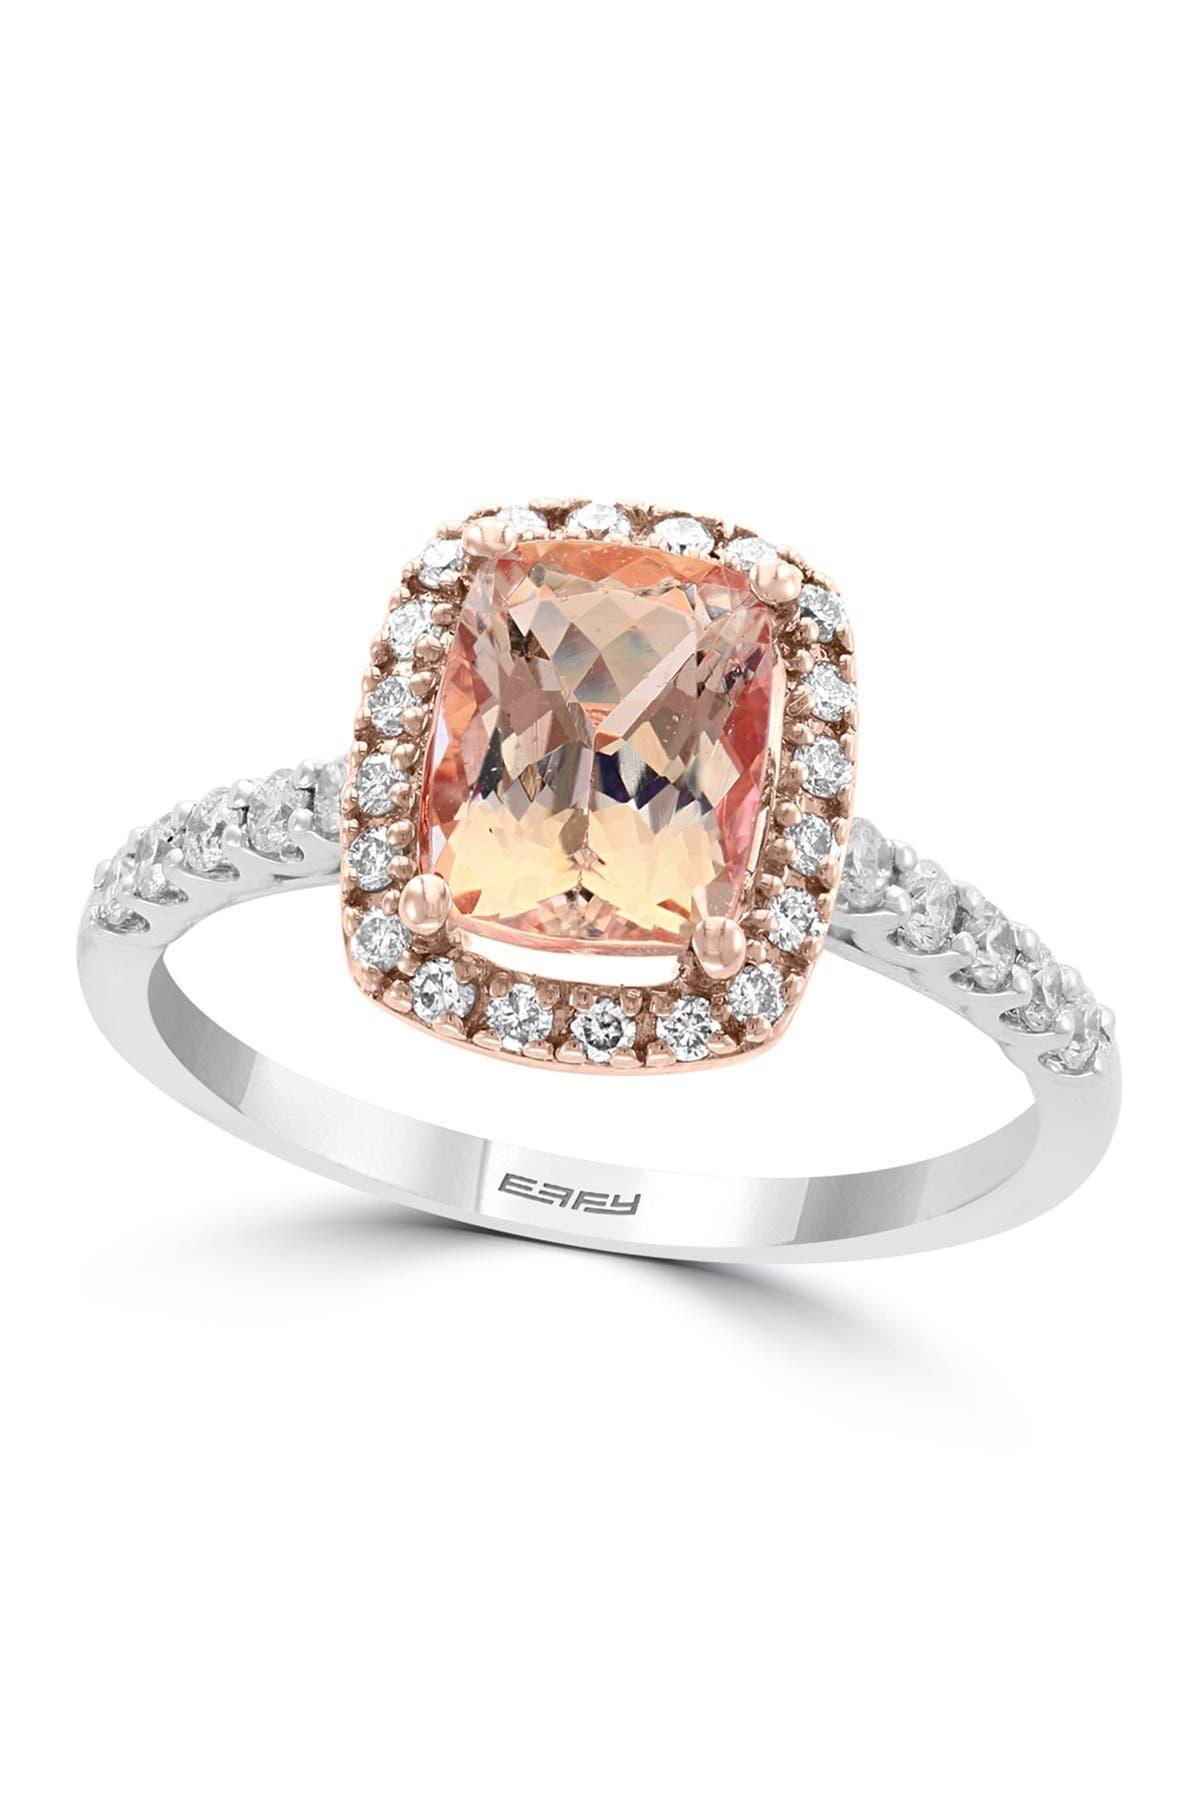 Image of Effy 18K White Gold Prong Set Morgantie & Pave Diamond Ring - Size 7 - 0.34 ctw